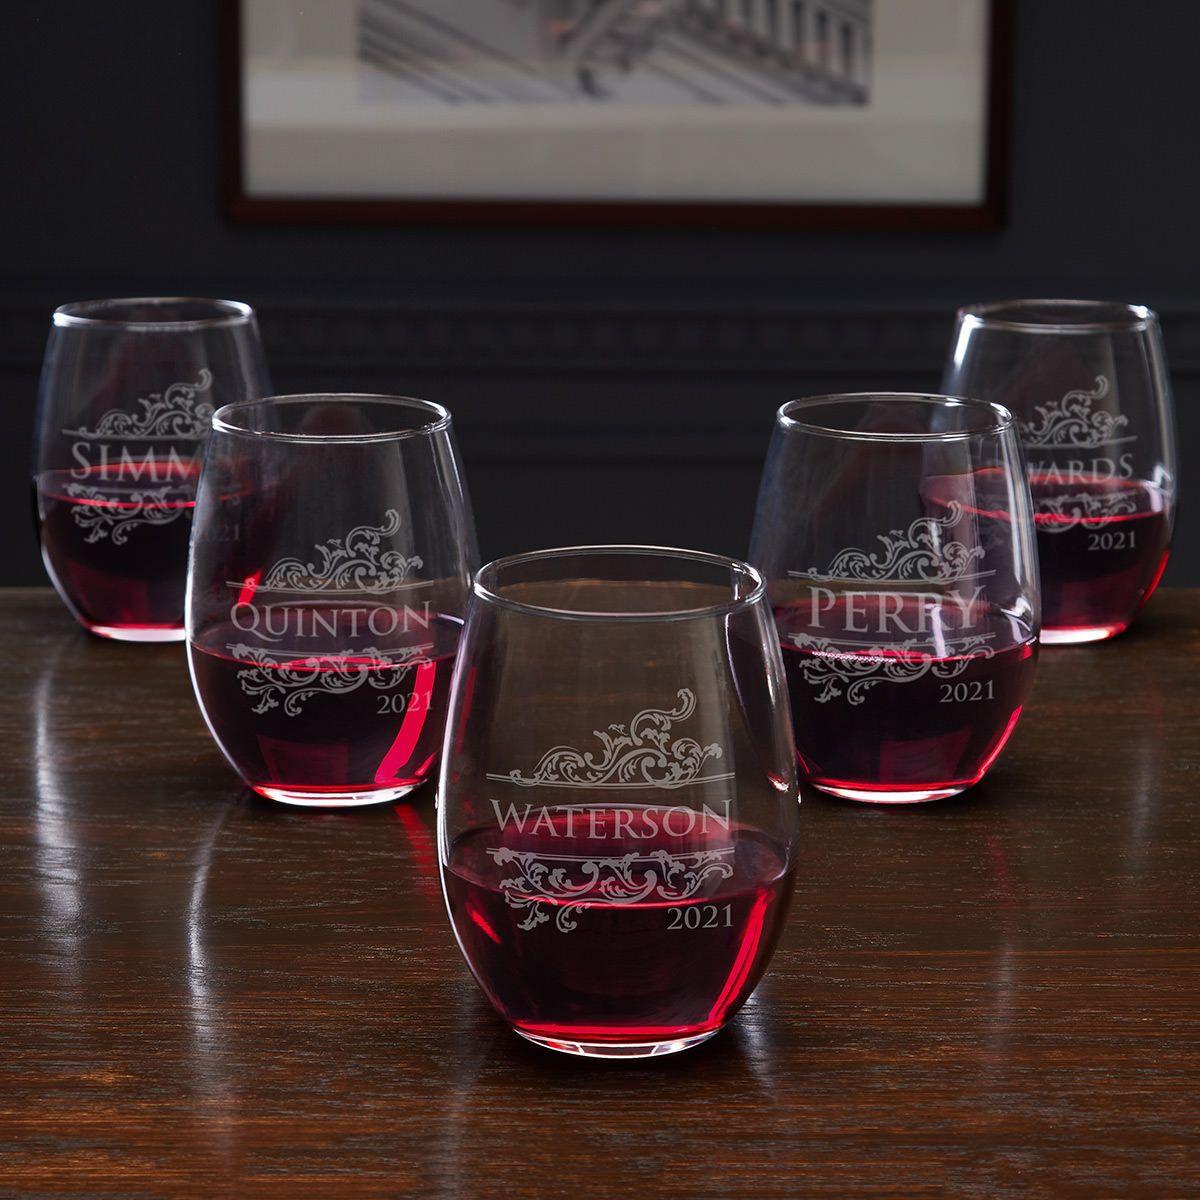 Livingston Personalized Stemless Wine Glasses for Weddings